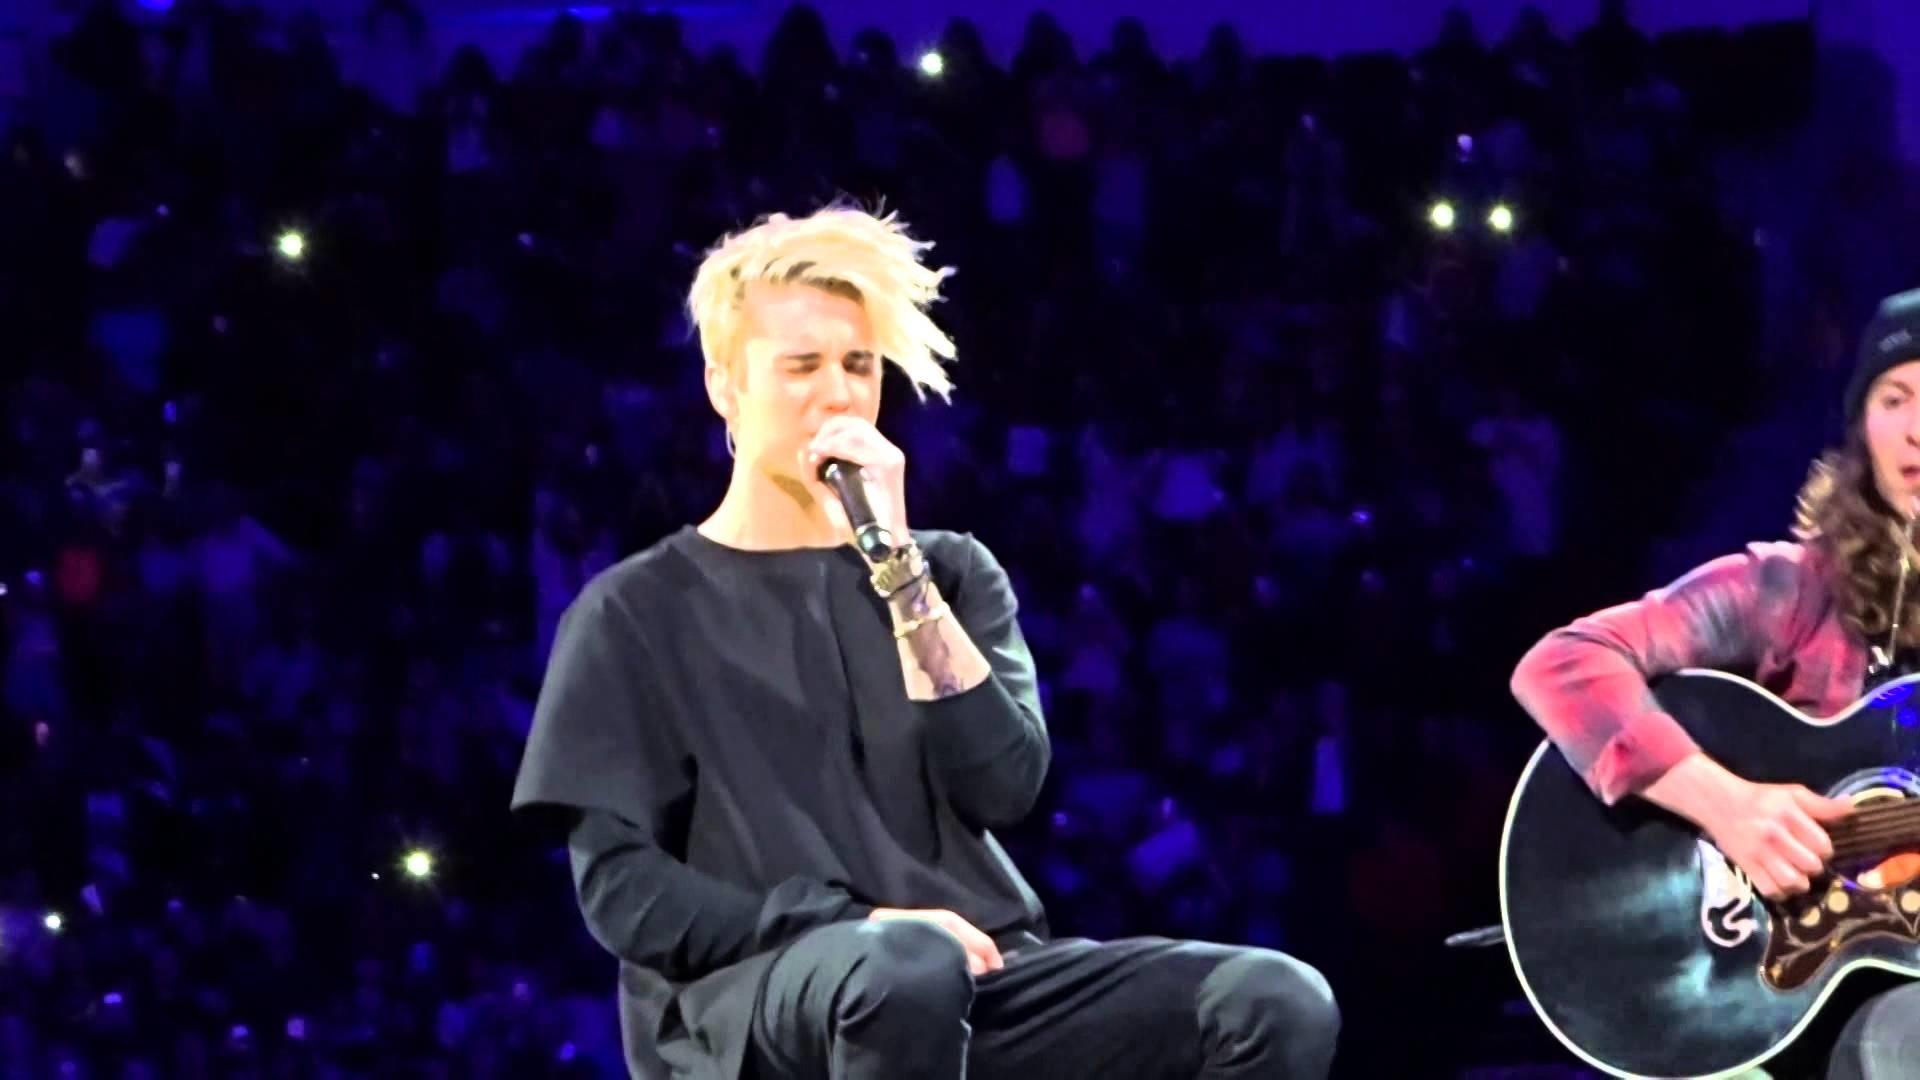 … Justin Bieber photo 8